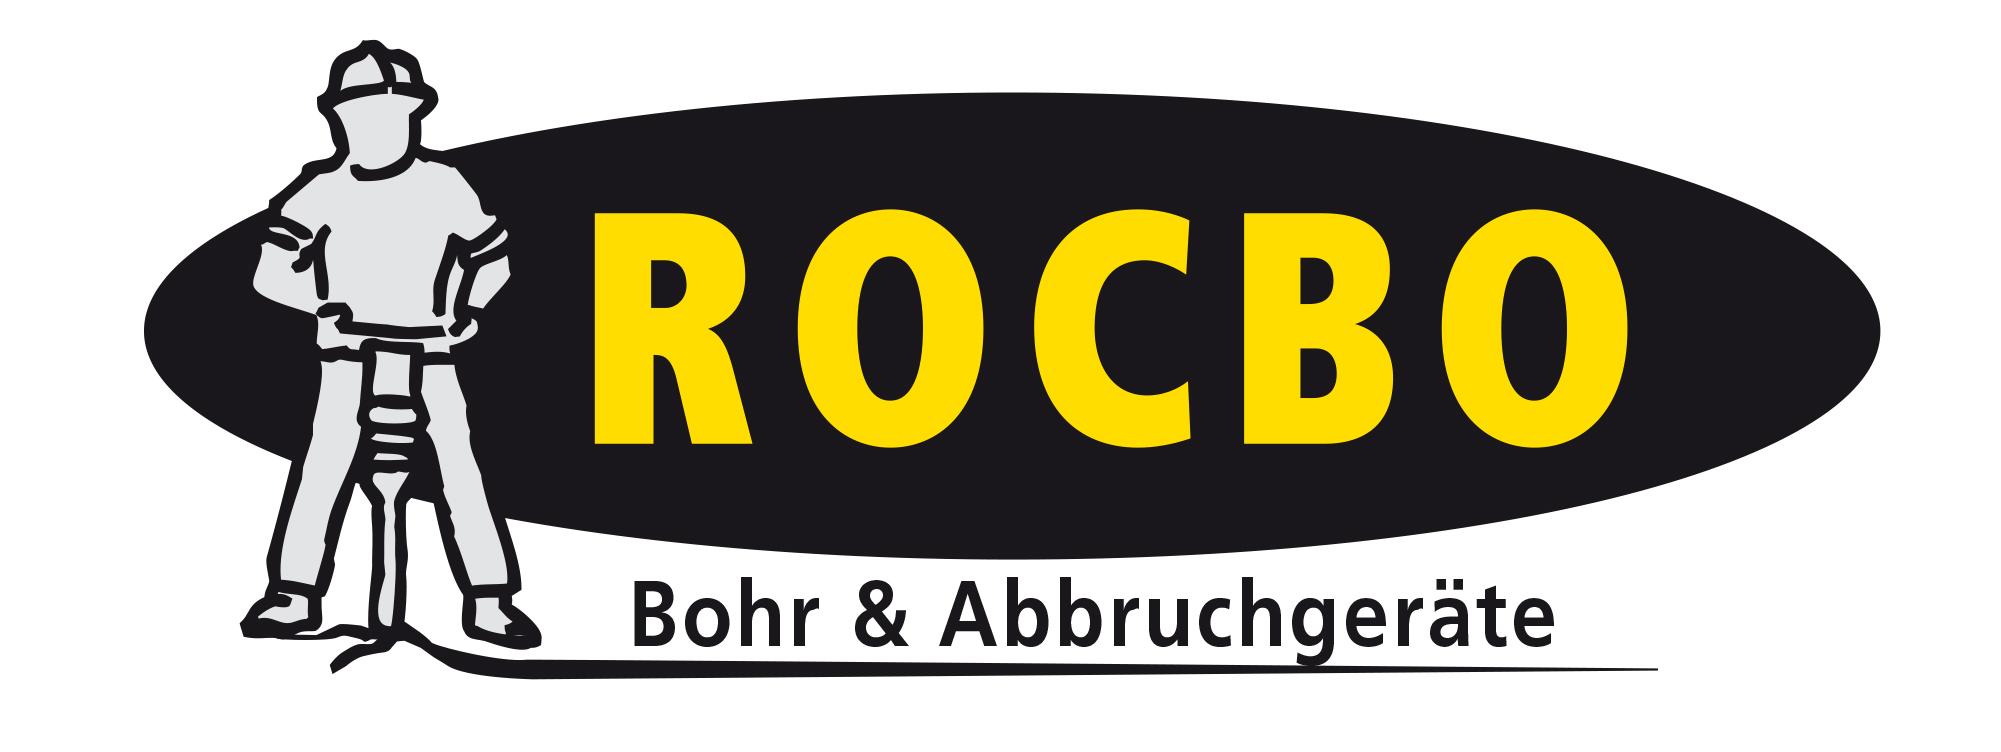 ROCBO Boortechniek BV